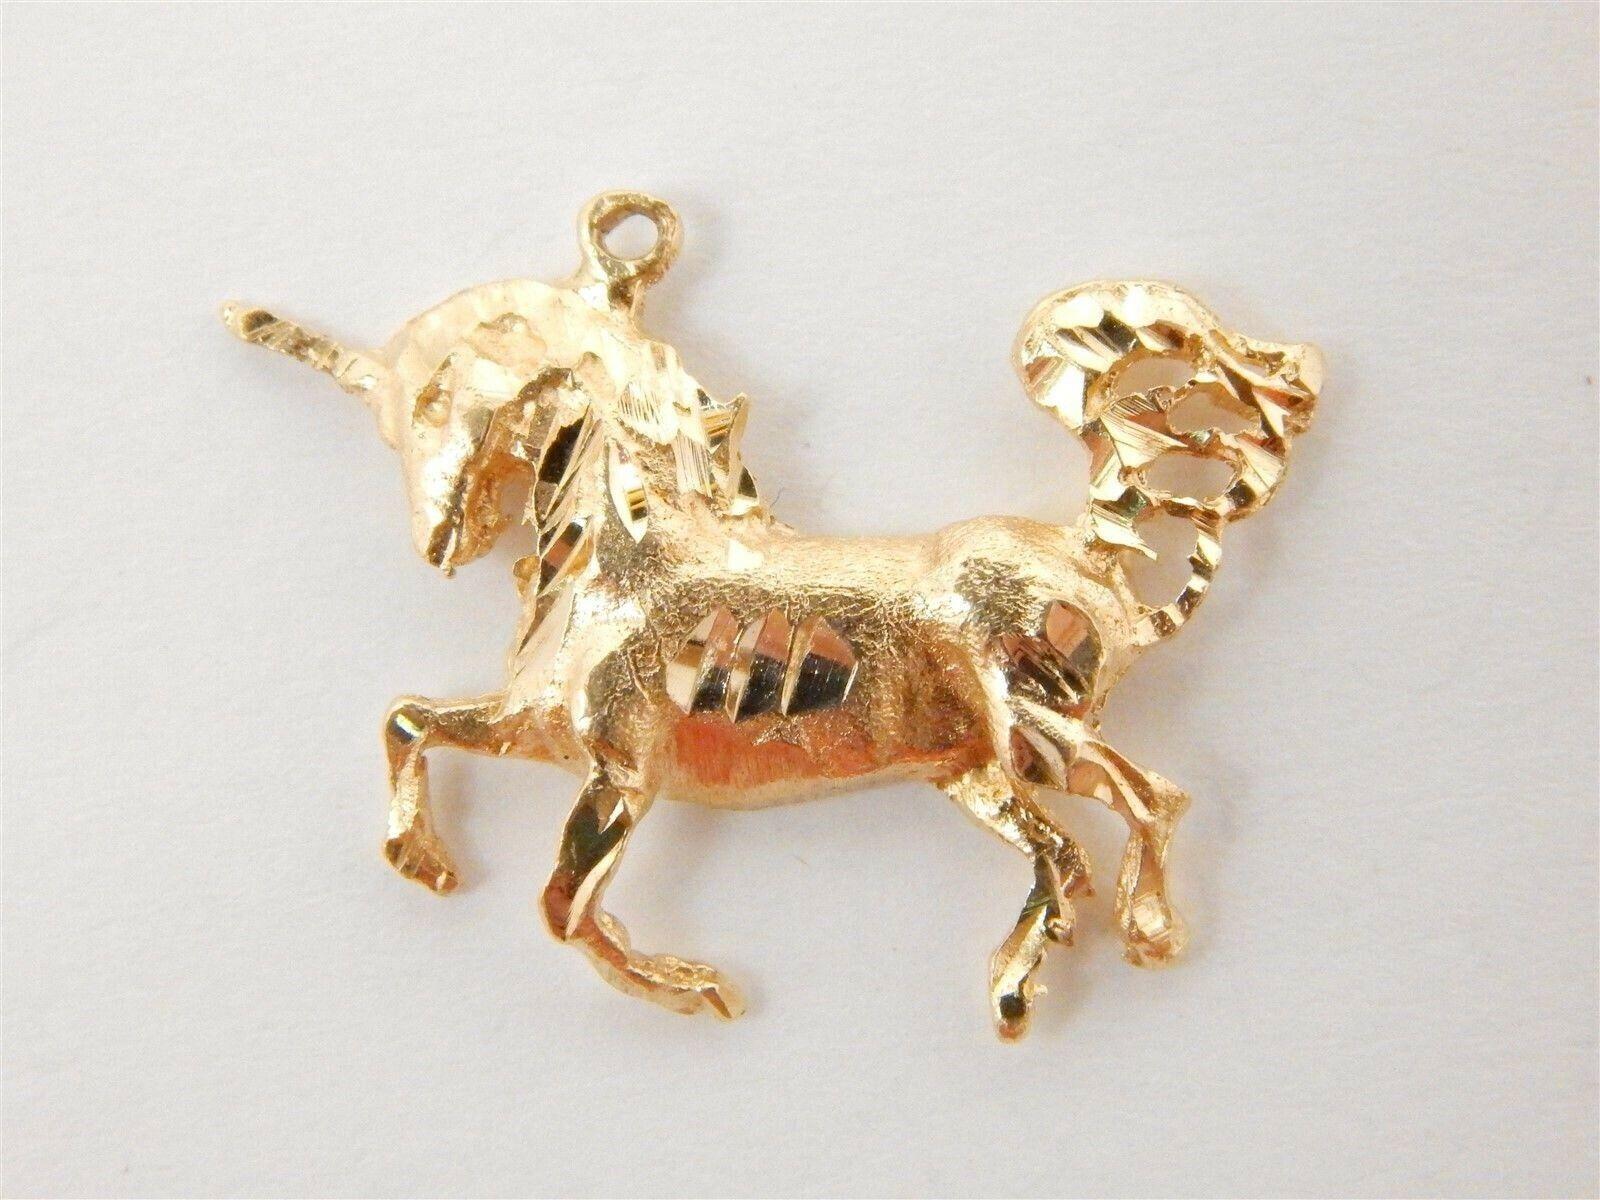 14k Yellow  gold Diamond Cut Unicorn Pendant   2.2 grams